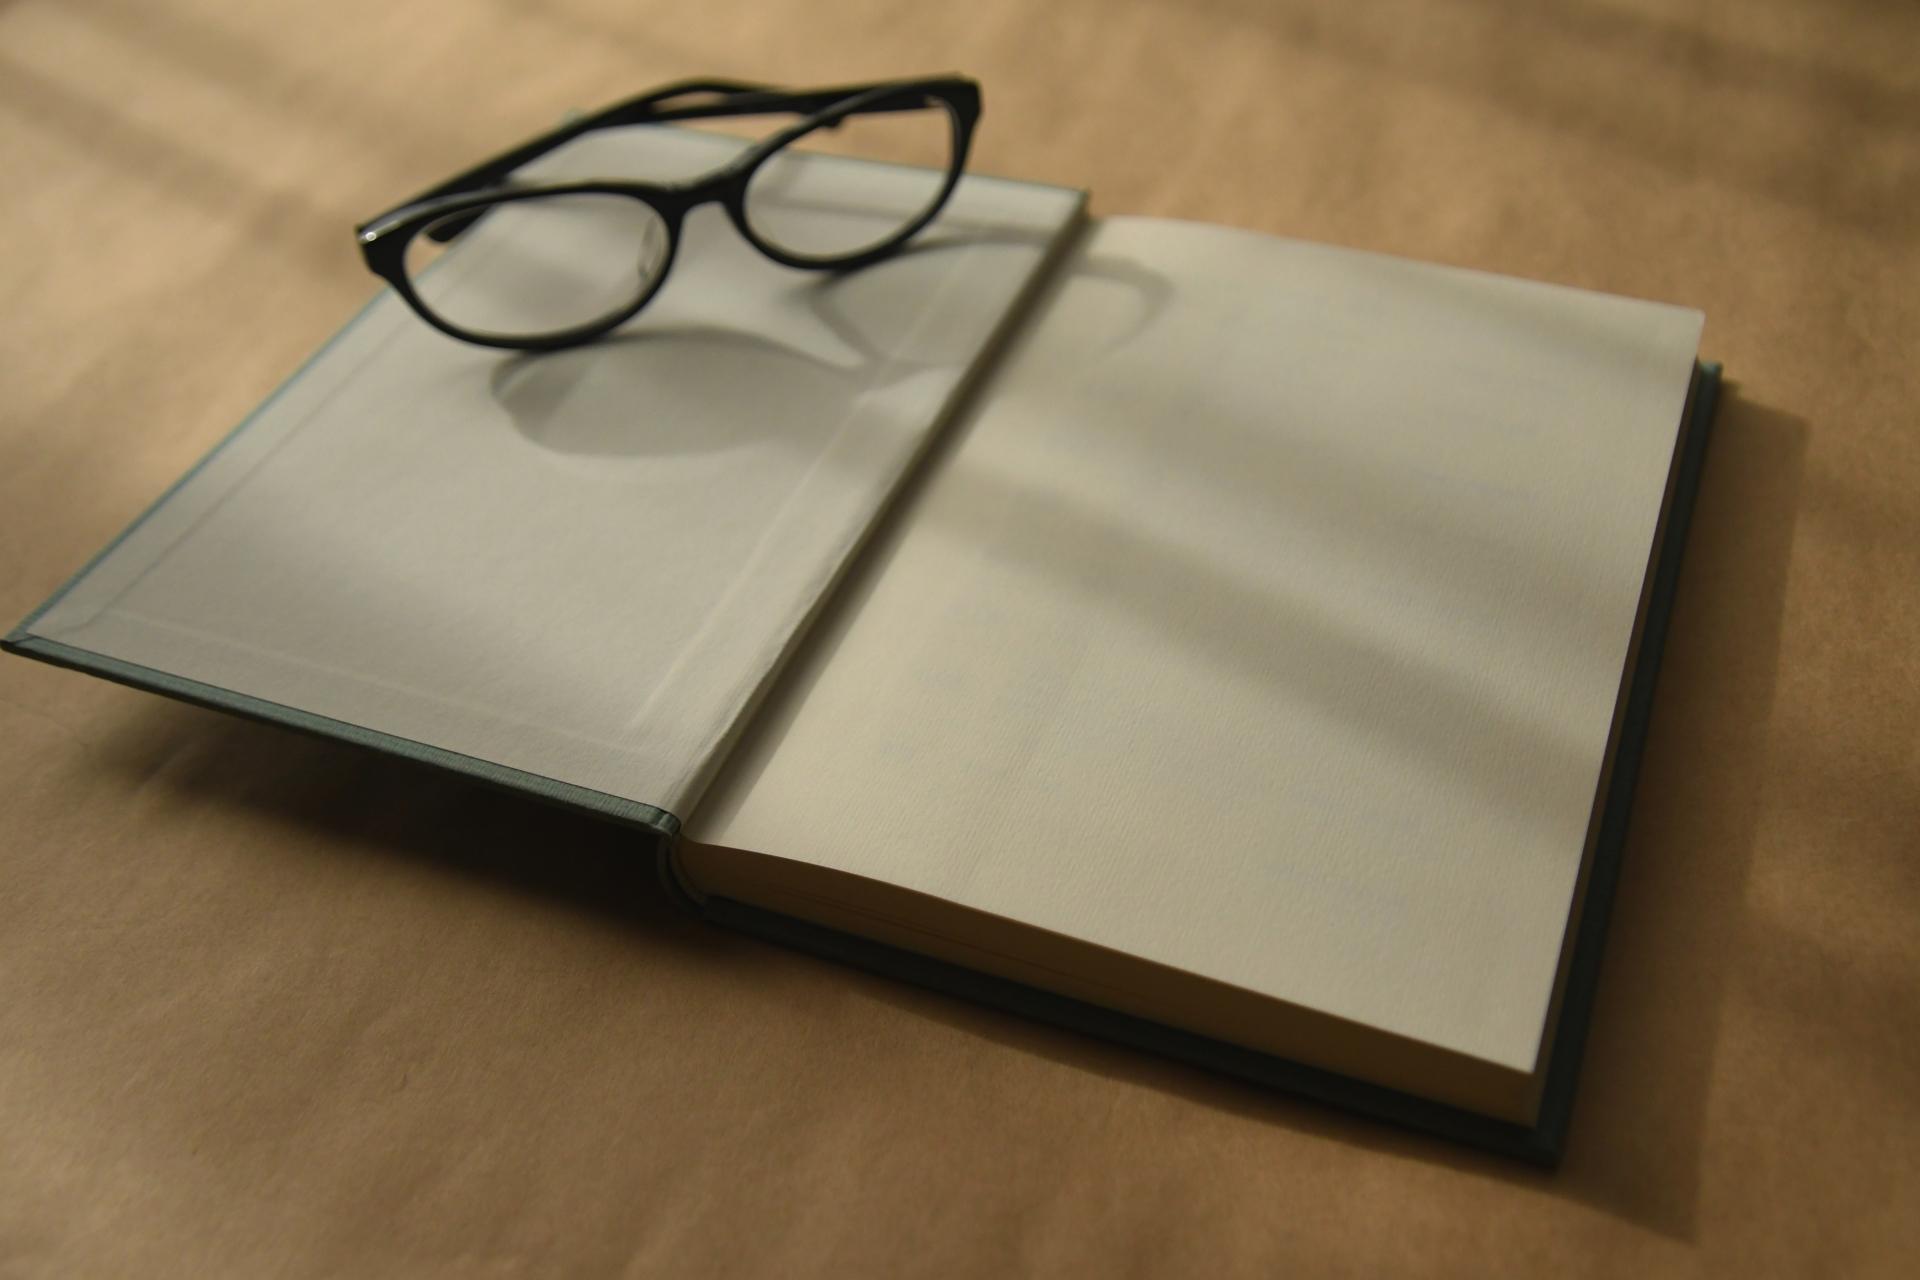 Chromebook guidebook